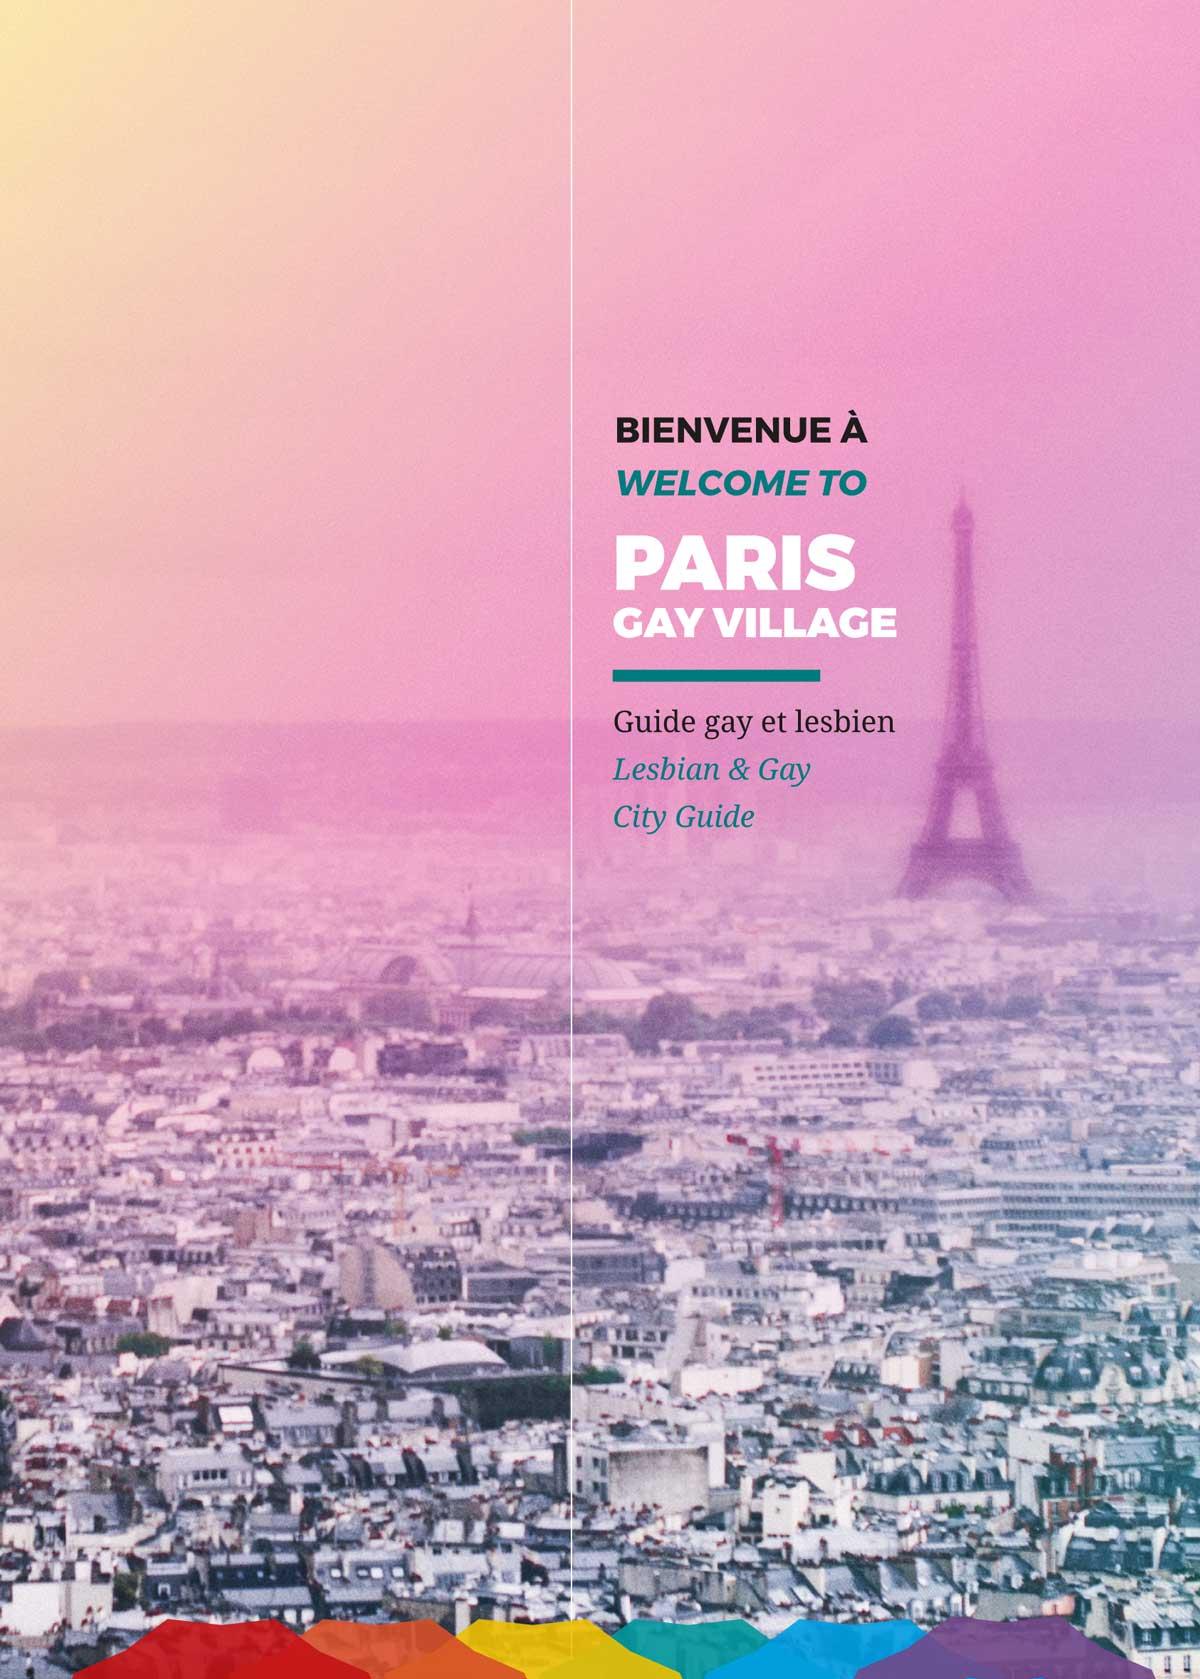 Gay & lesbian Paris guide